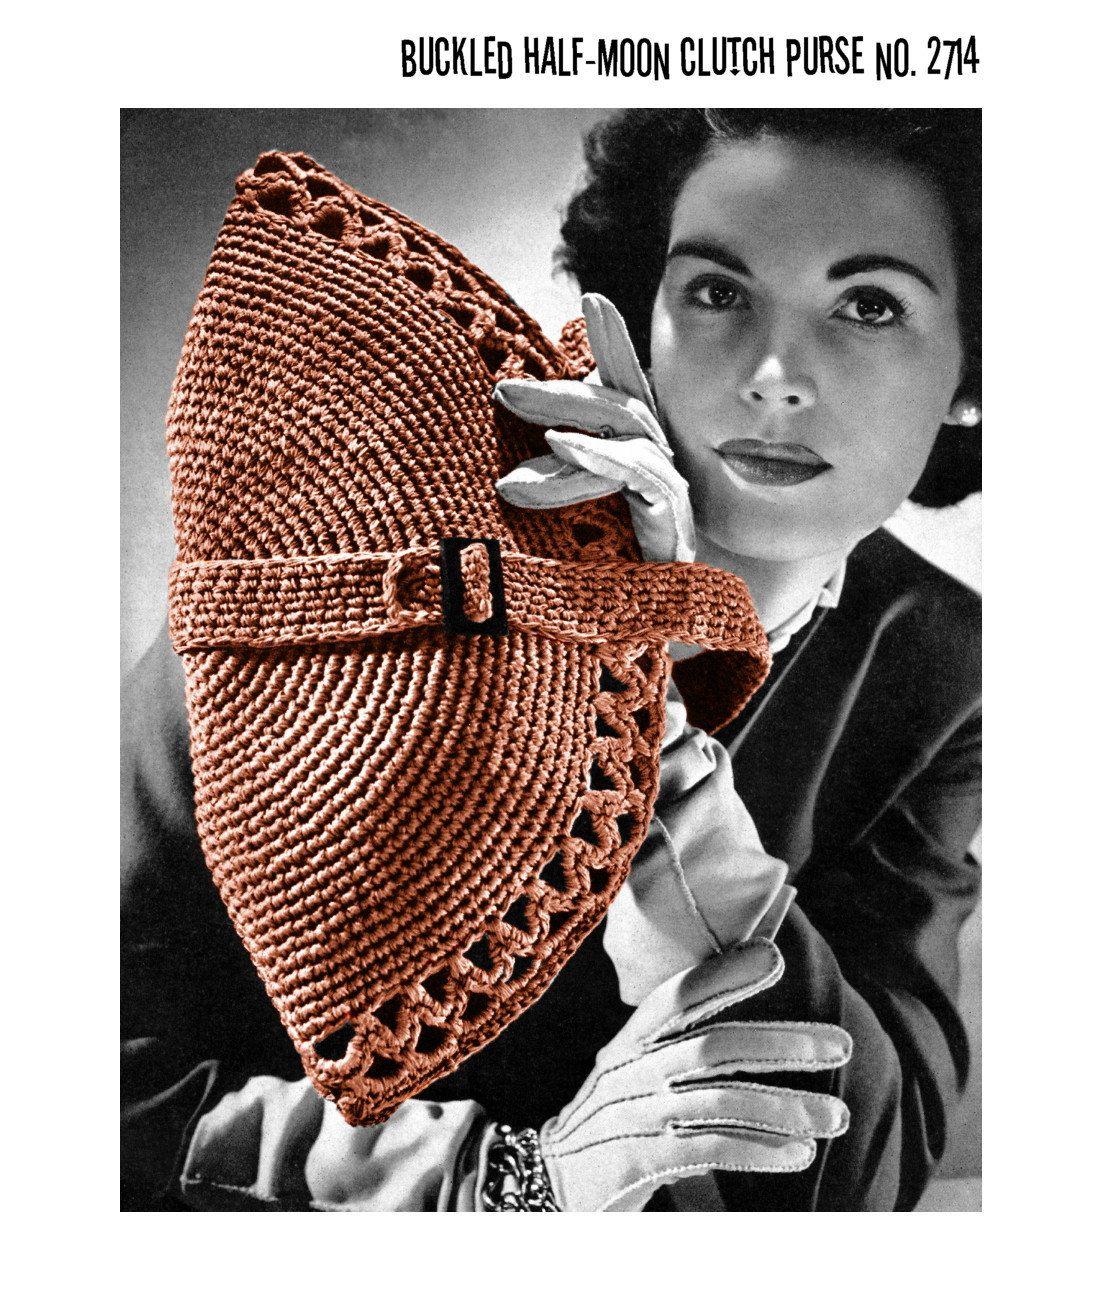 vintage 1940s crochet pattern half moon purse buckle strap clutch handbag pdf crochet. Black Bedroom Furniture Sets. Home Design Ideas